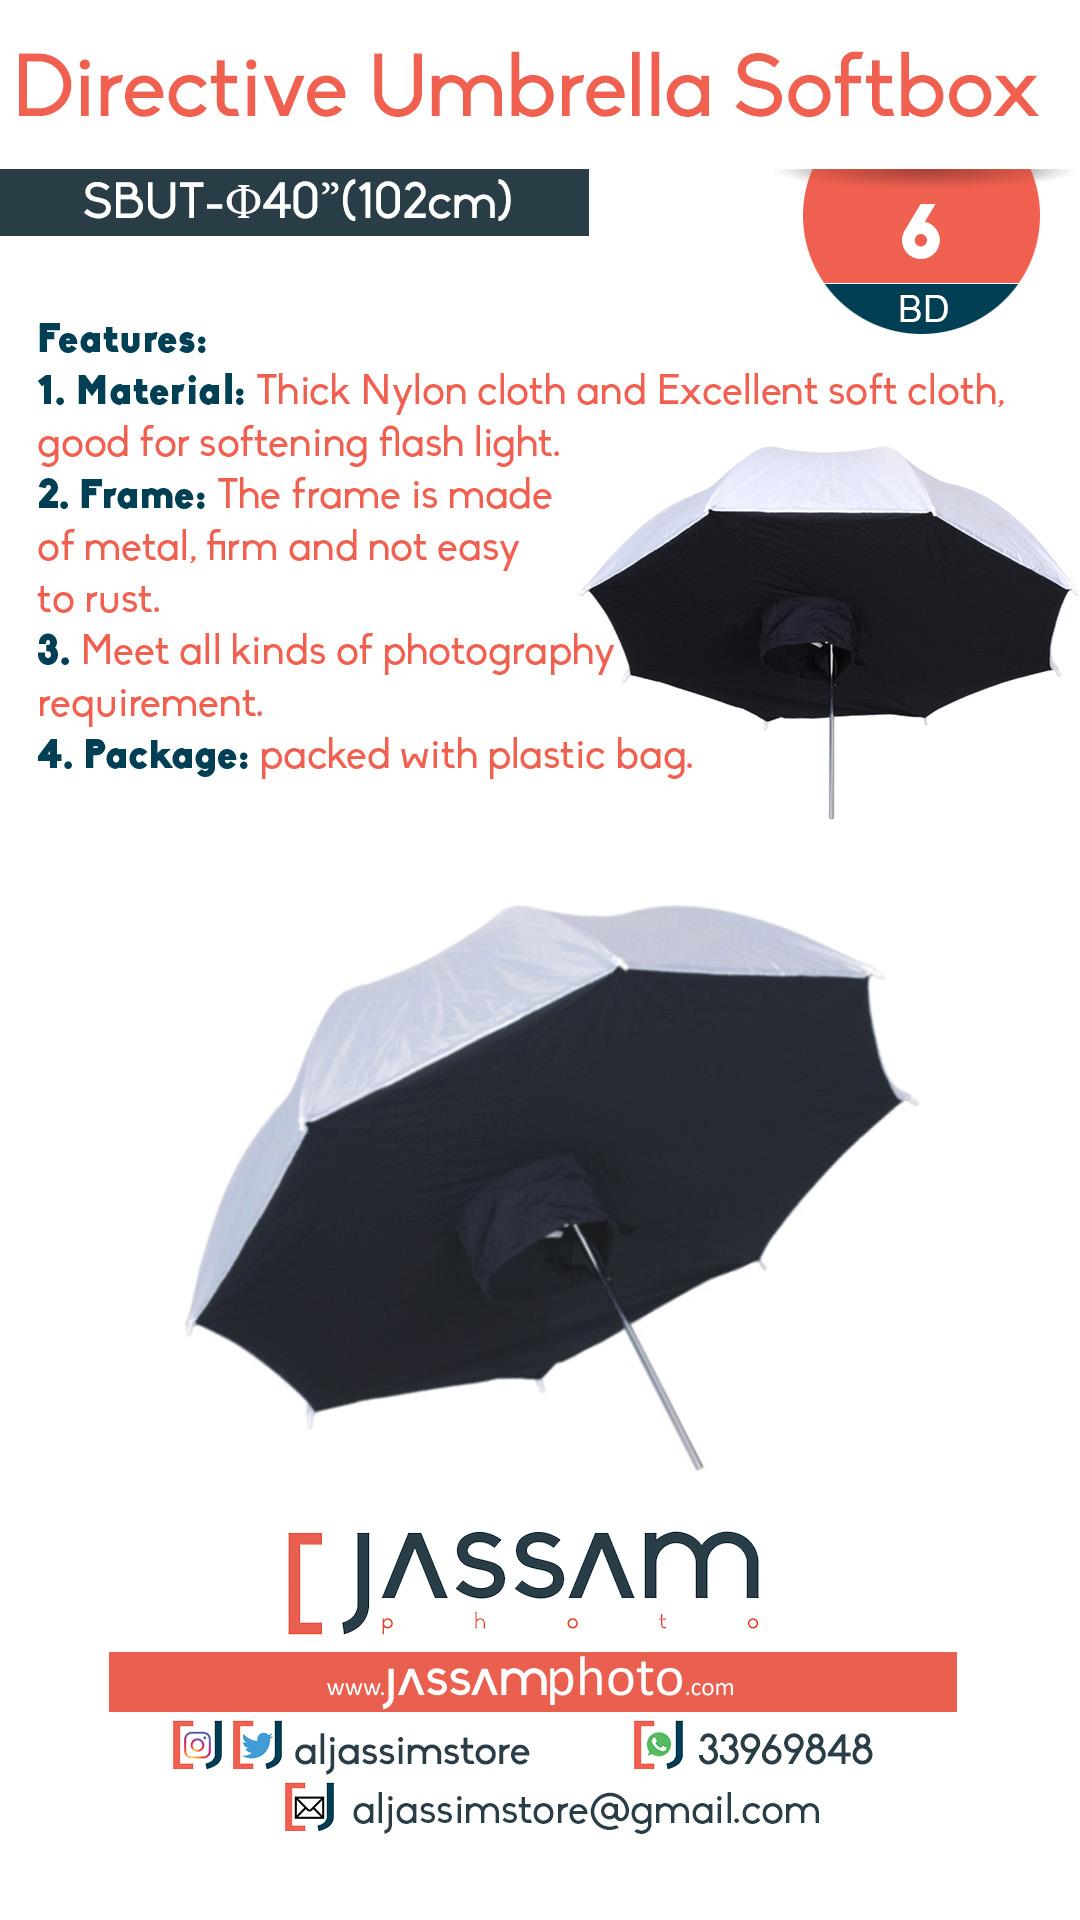 Directive Umbrella